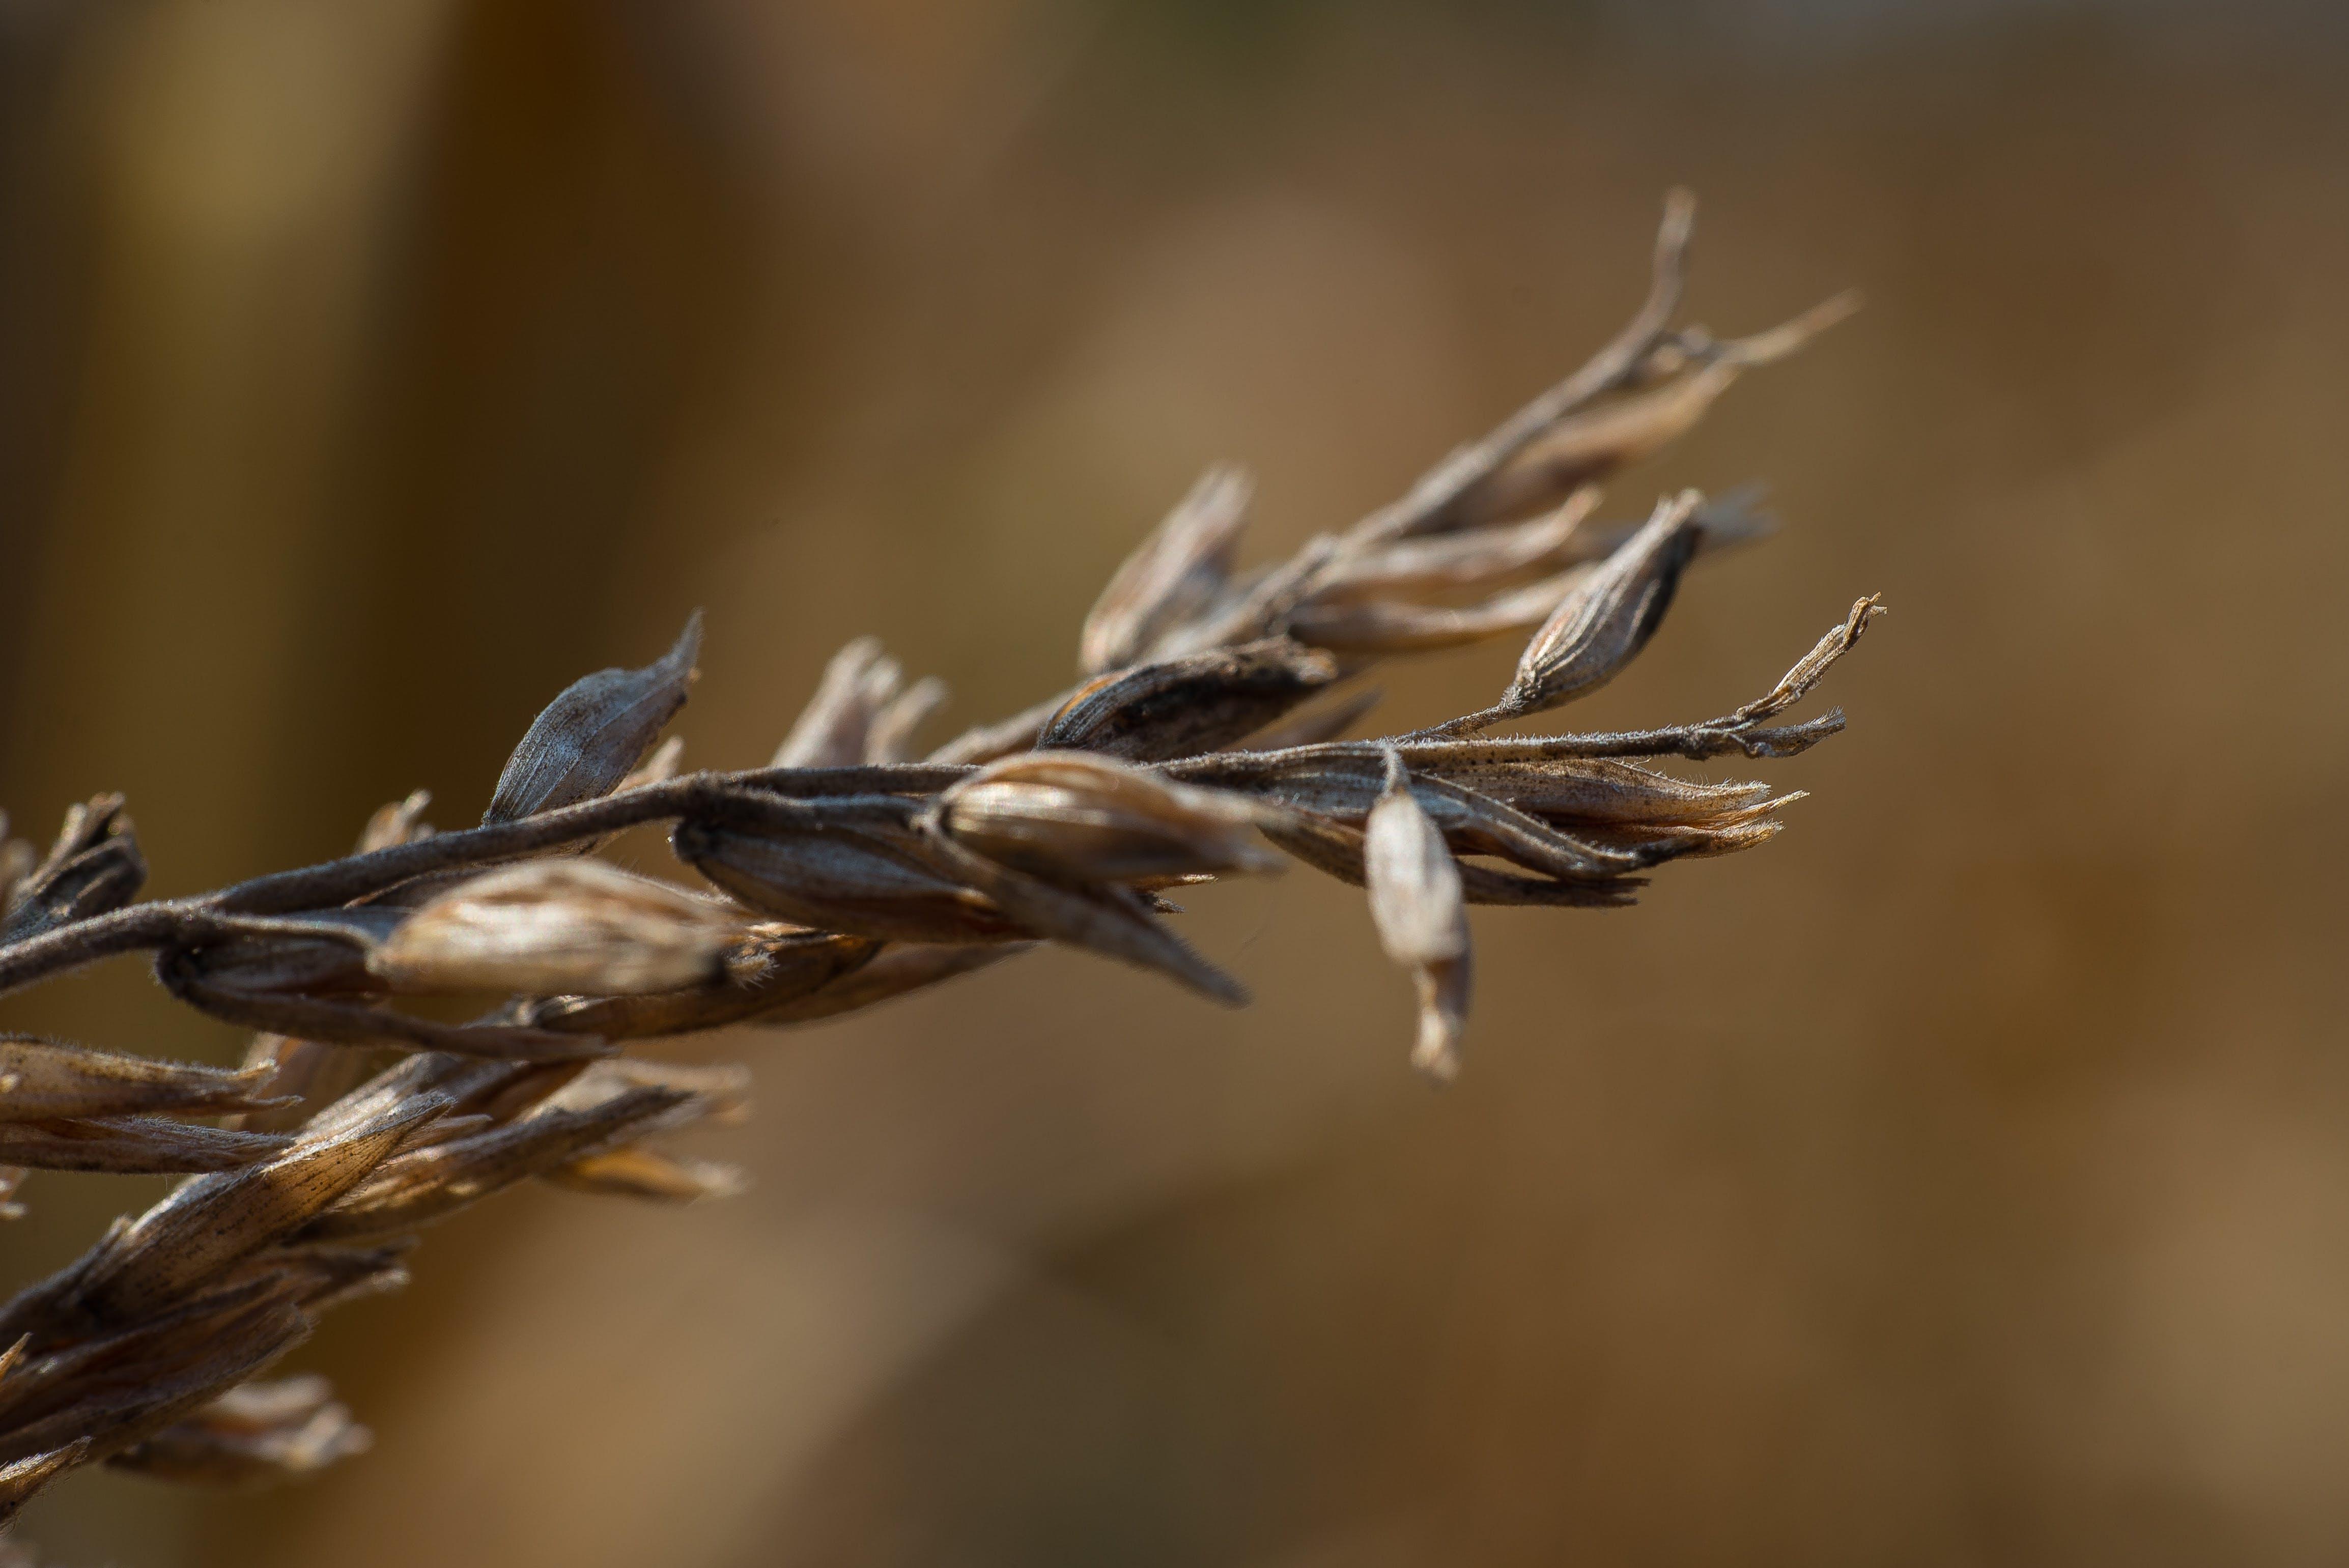 Free stock photo of dry flower